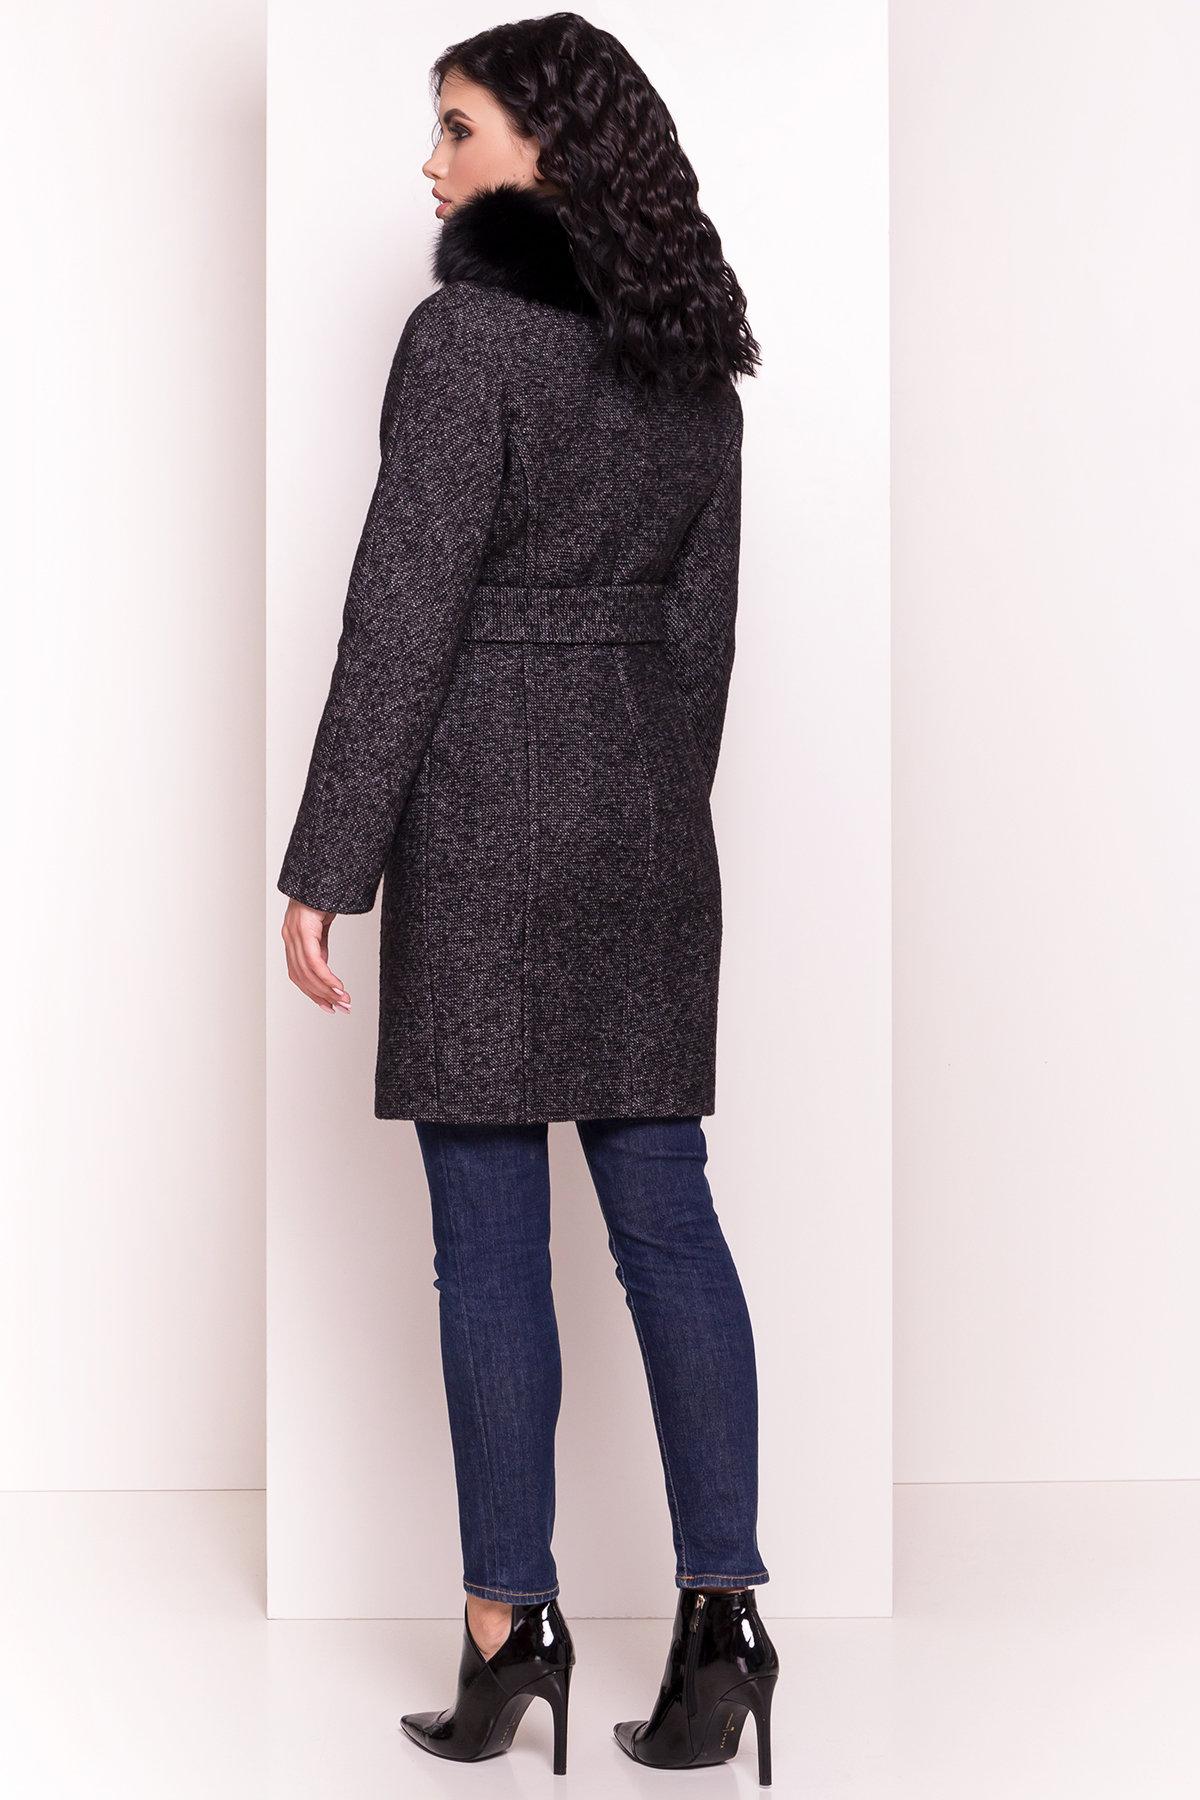 Пальто зима Дакар 4447 АРТ. 5237 Цвет: Черный белый - фото 3, интернет магазин tm-modus.ru